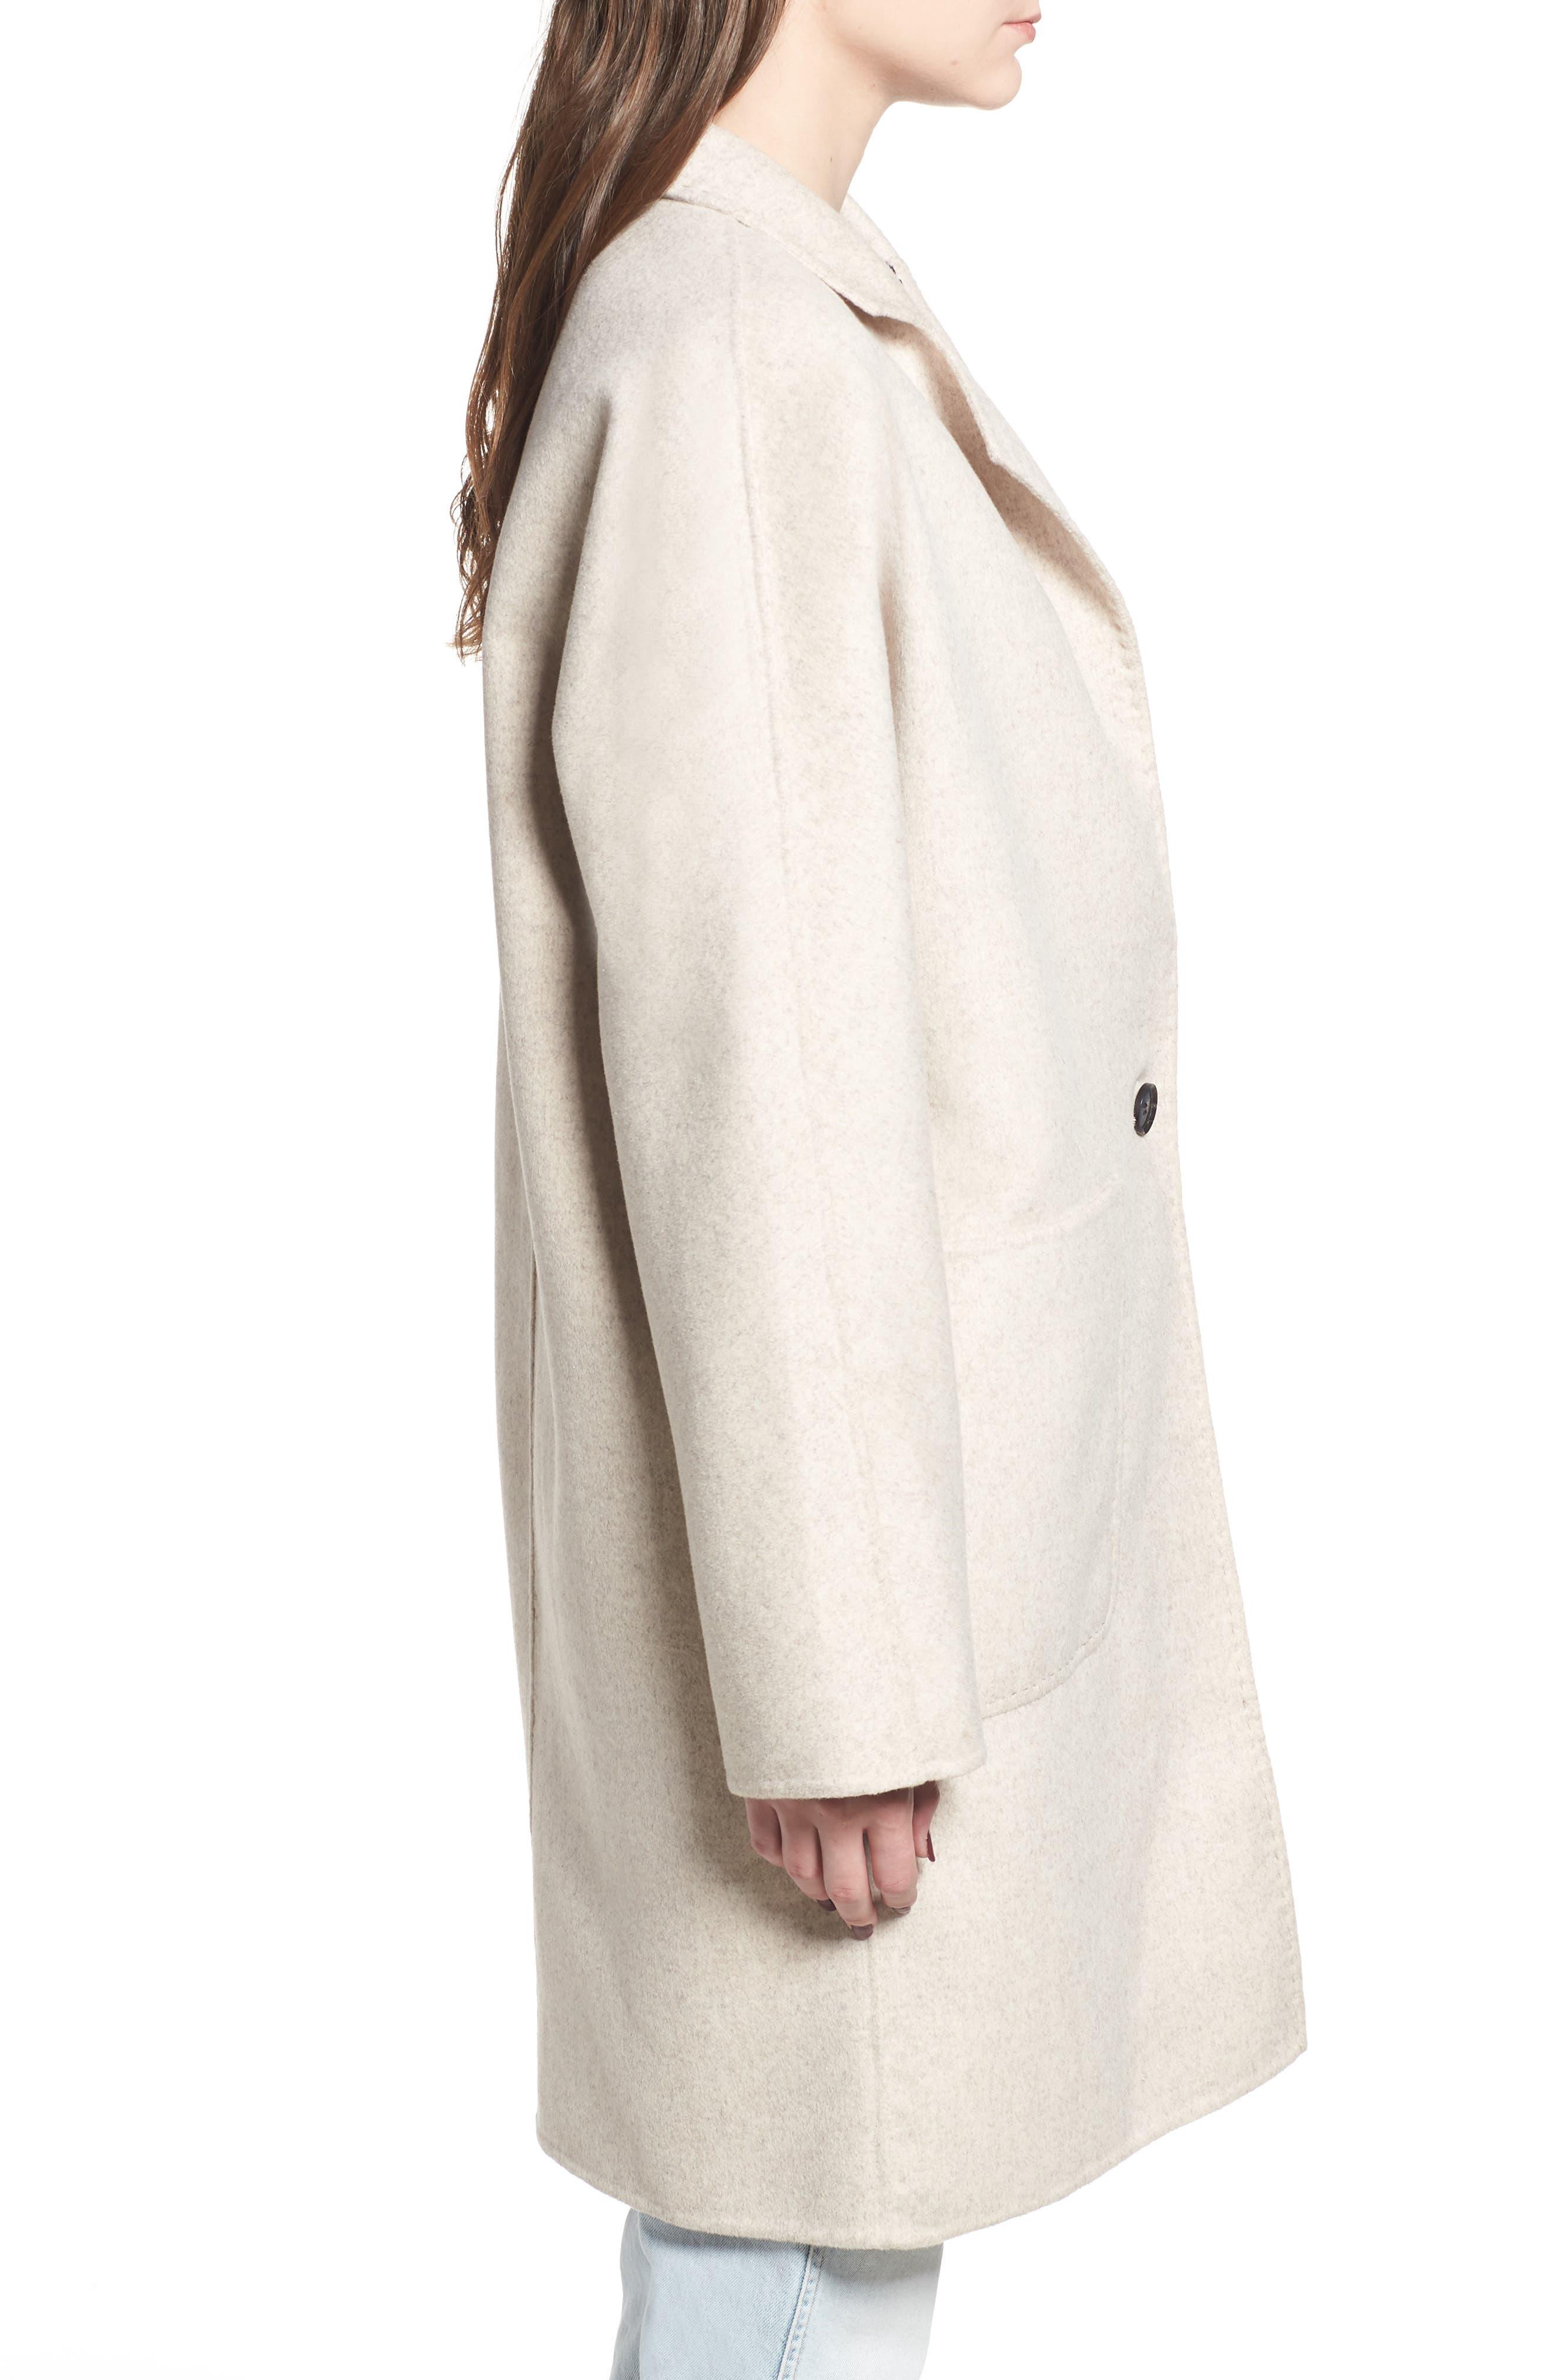 Everest Wool Blend Coat,                             Alternate thumbnail 4, color,                             905